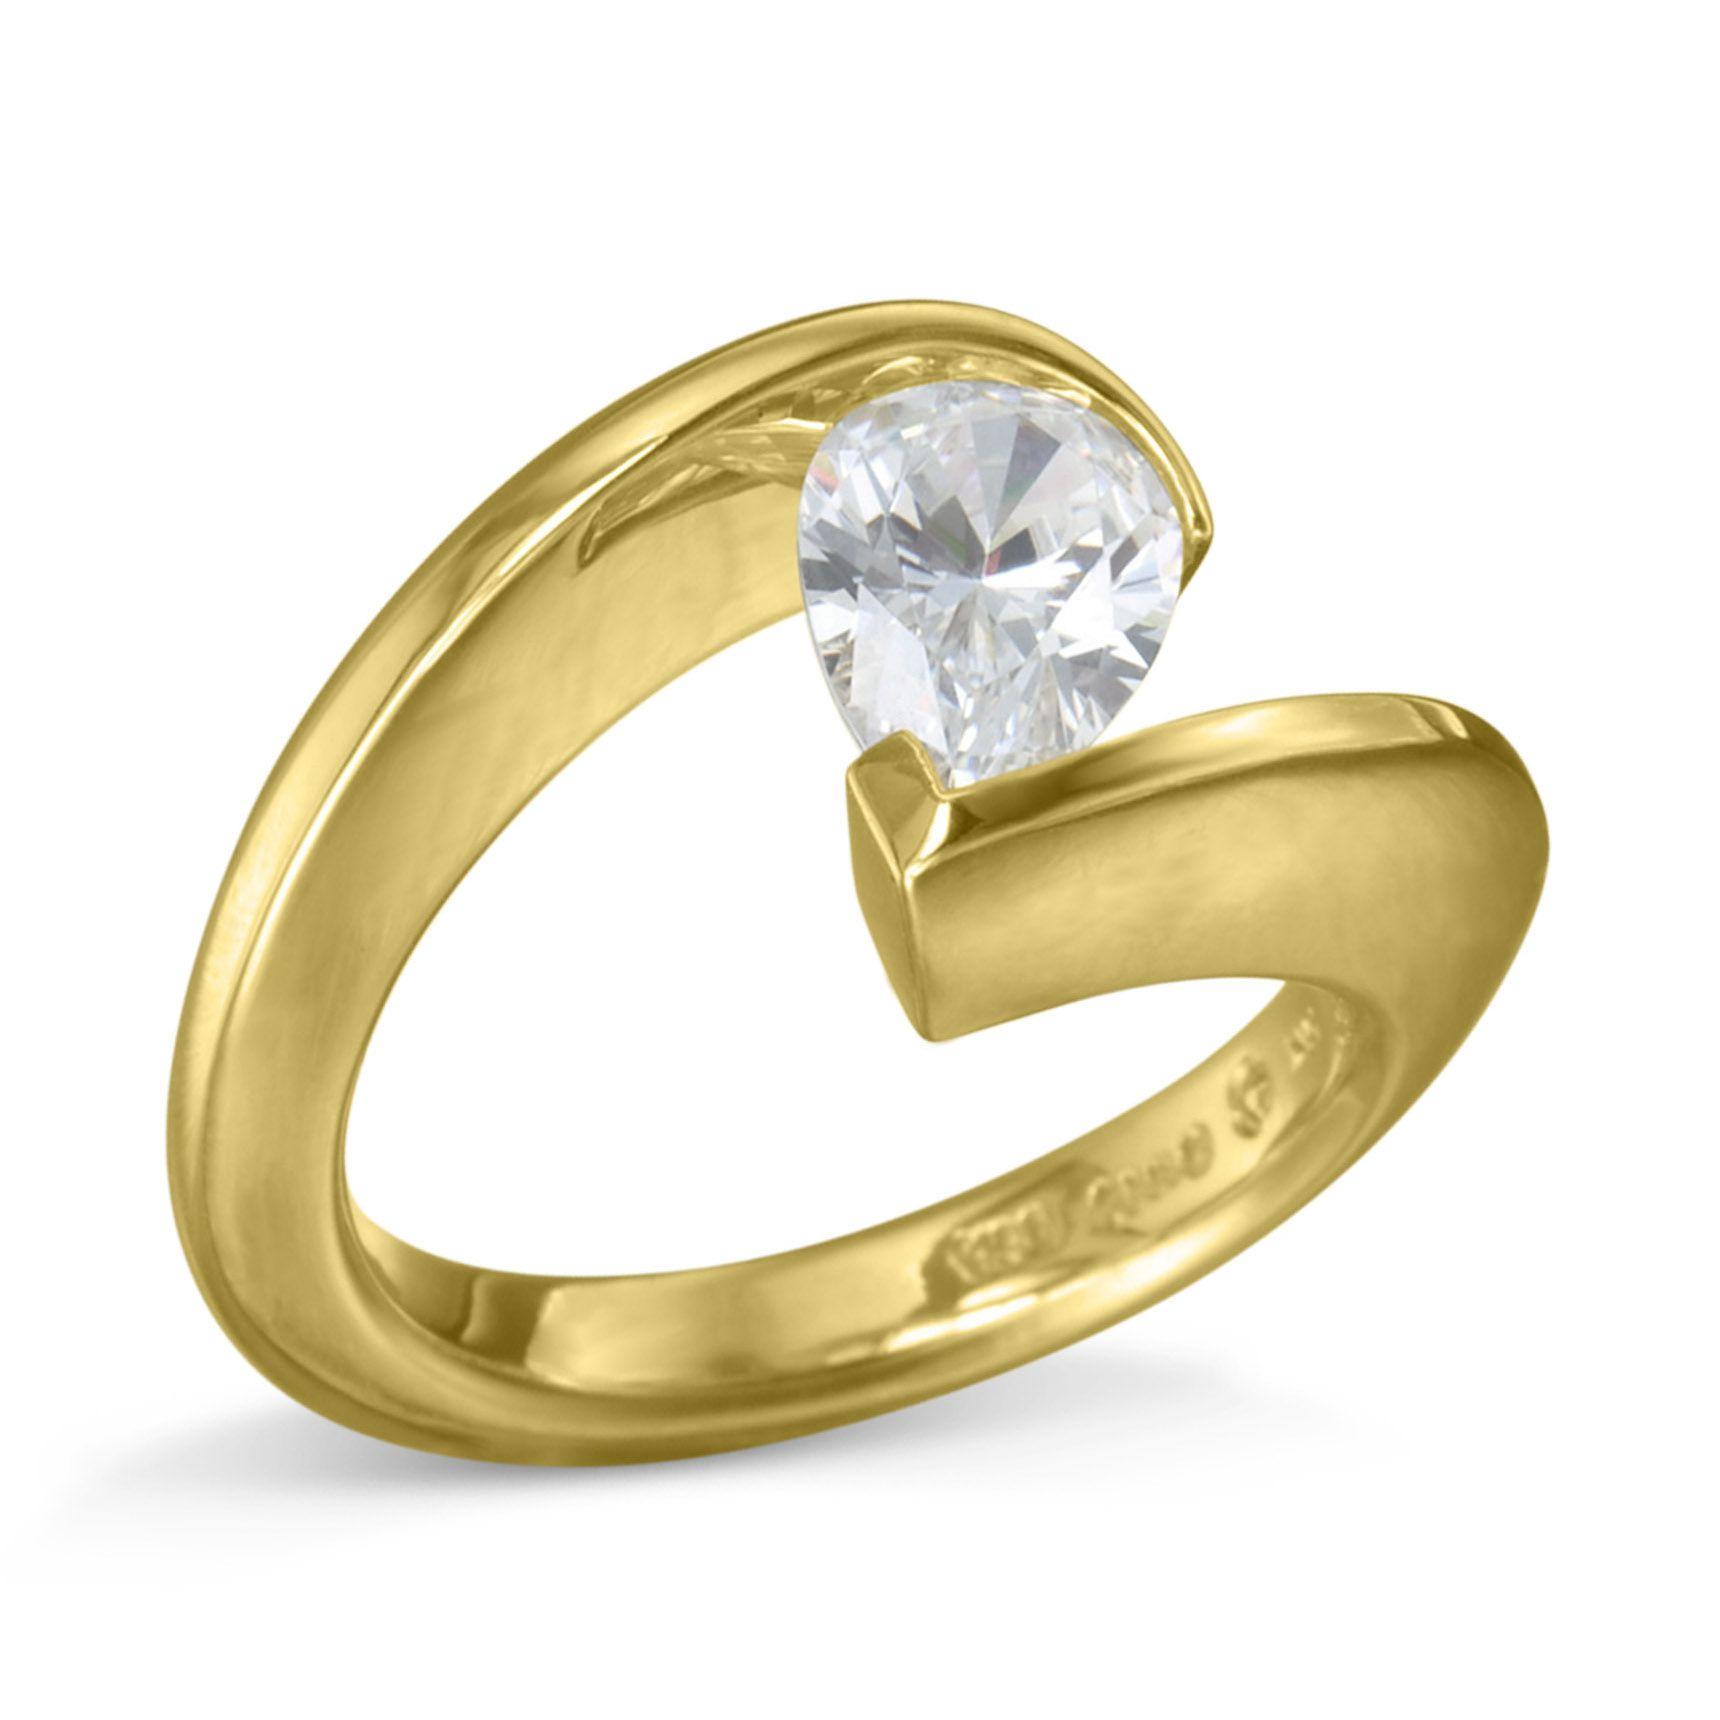 Turgeon Raine Pear Shaped Diamond Tension Set Ring